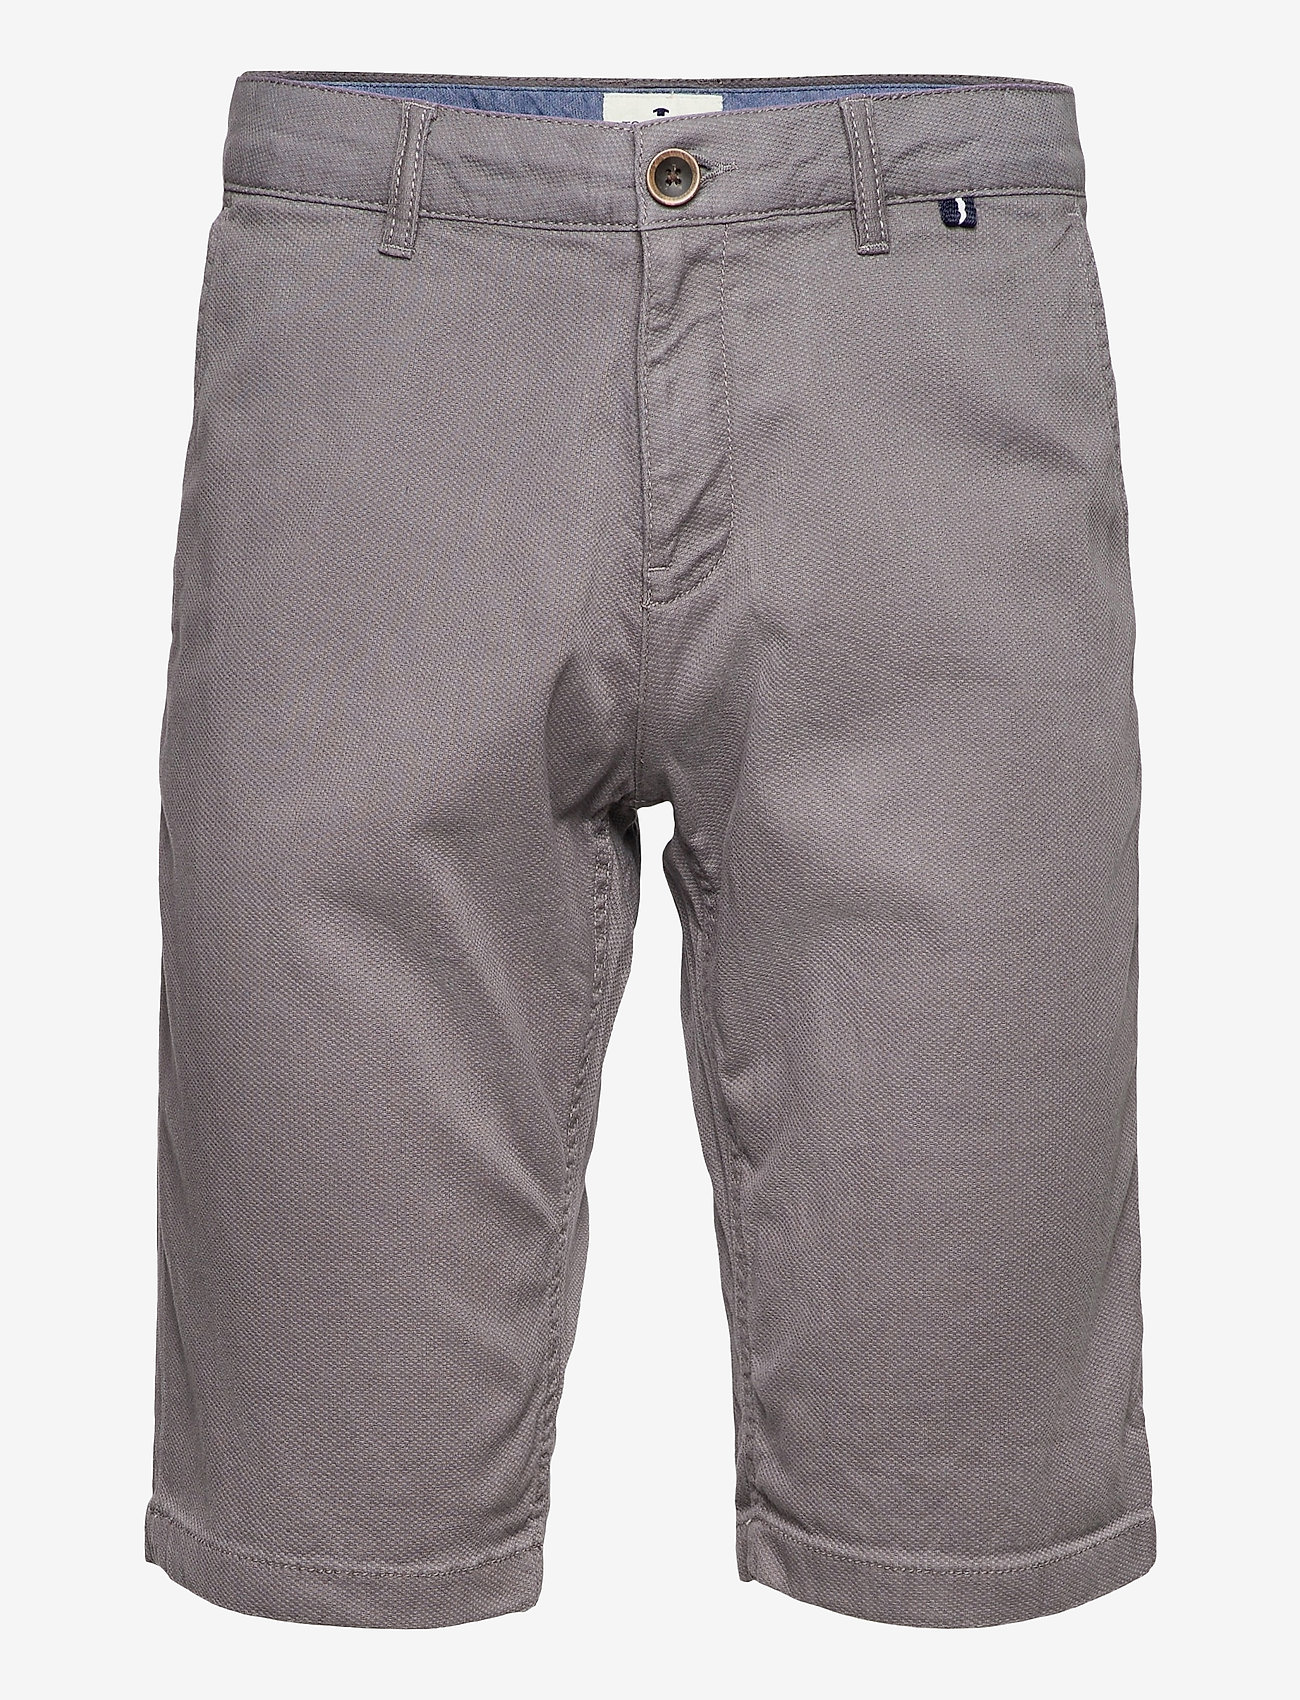 Tom Tailor - chino shorts - chinos shorts - castlerock grey - 0